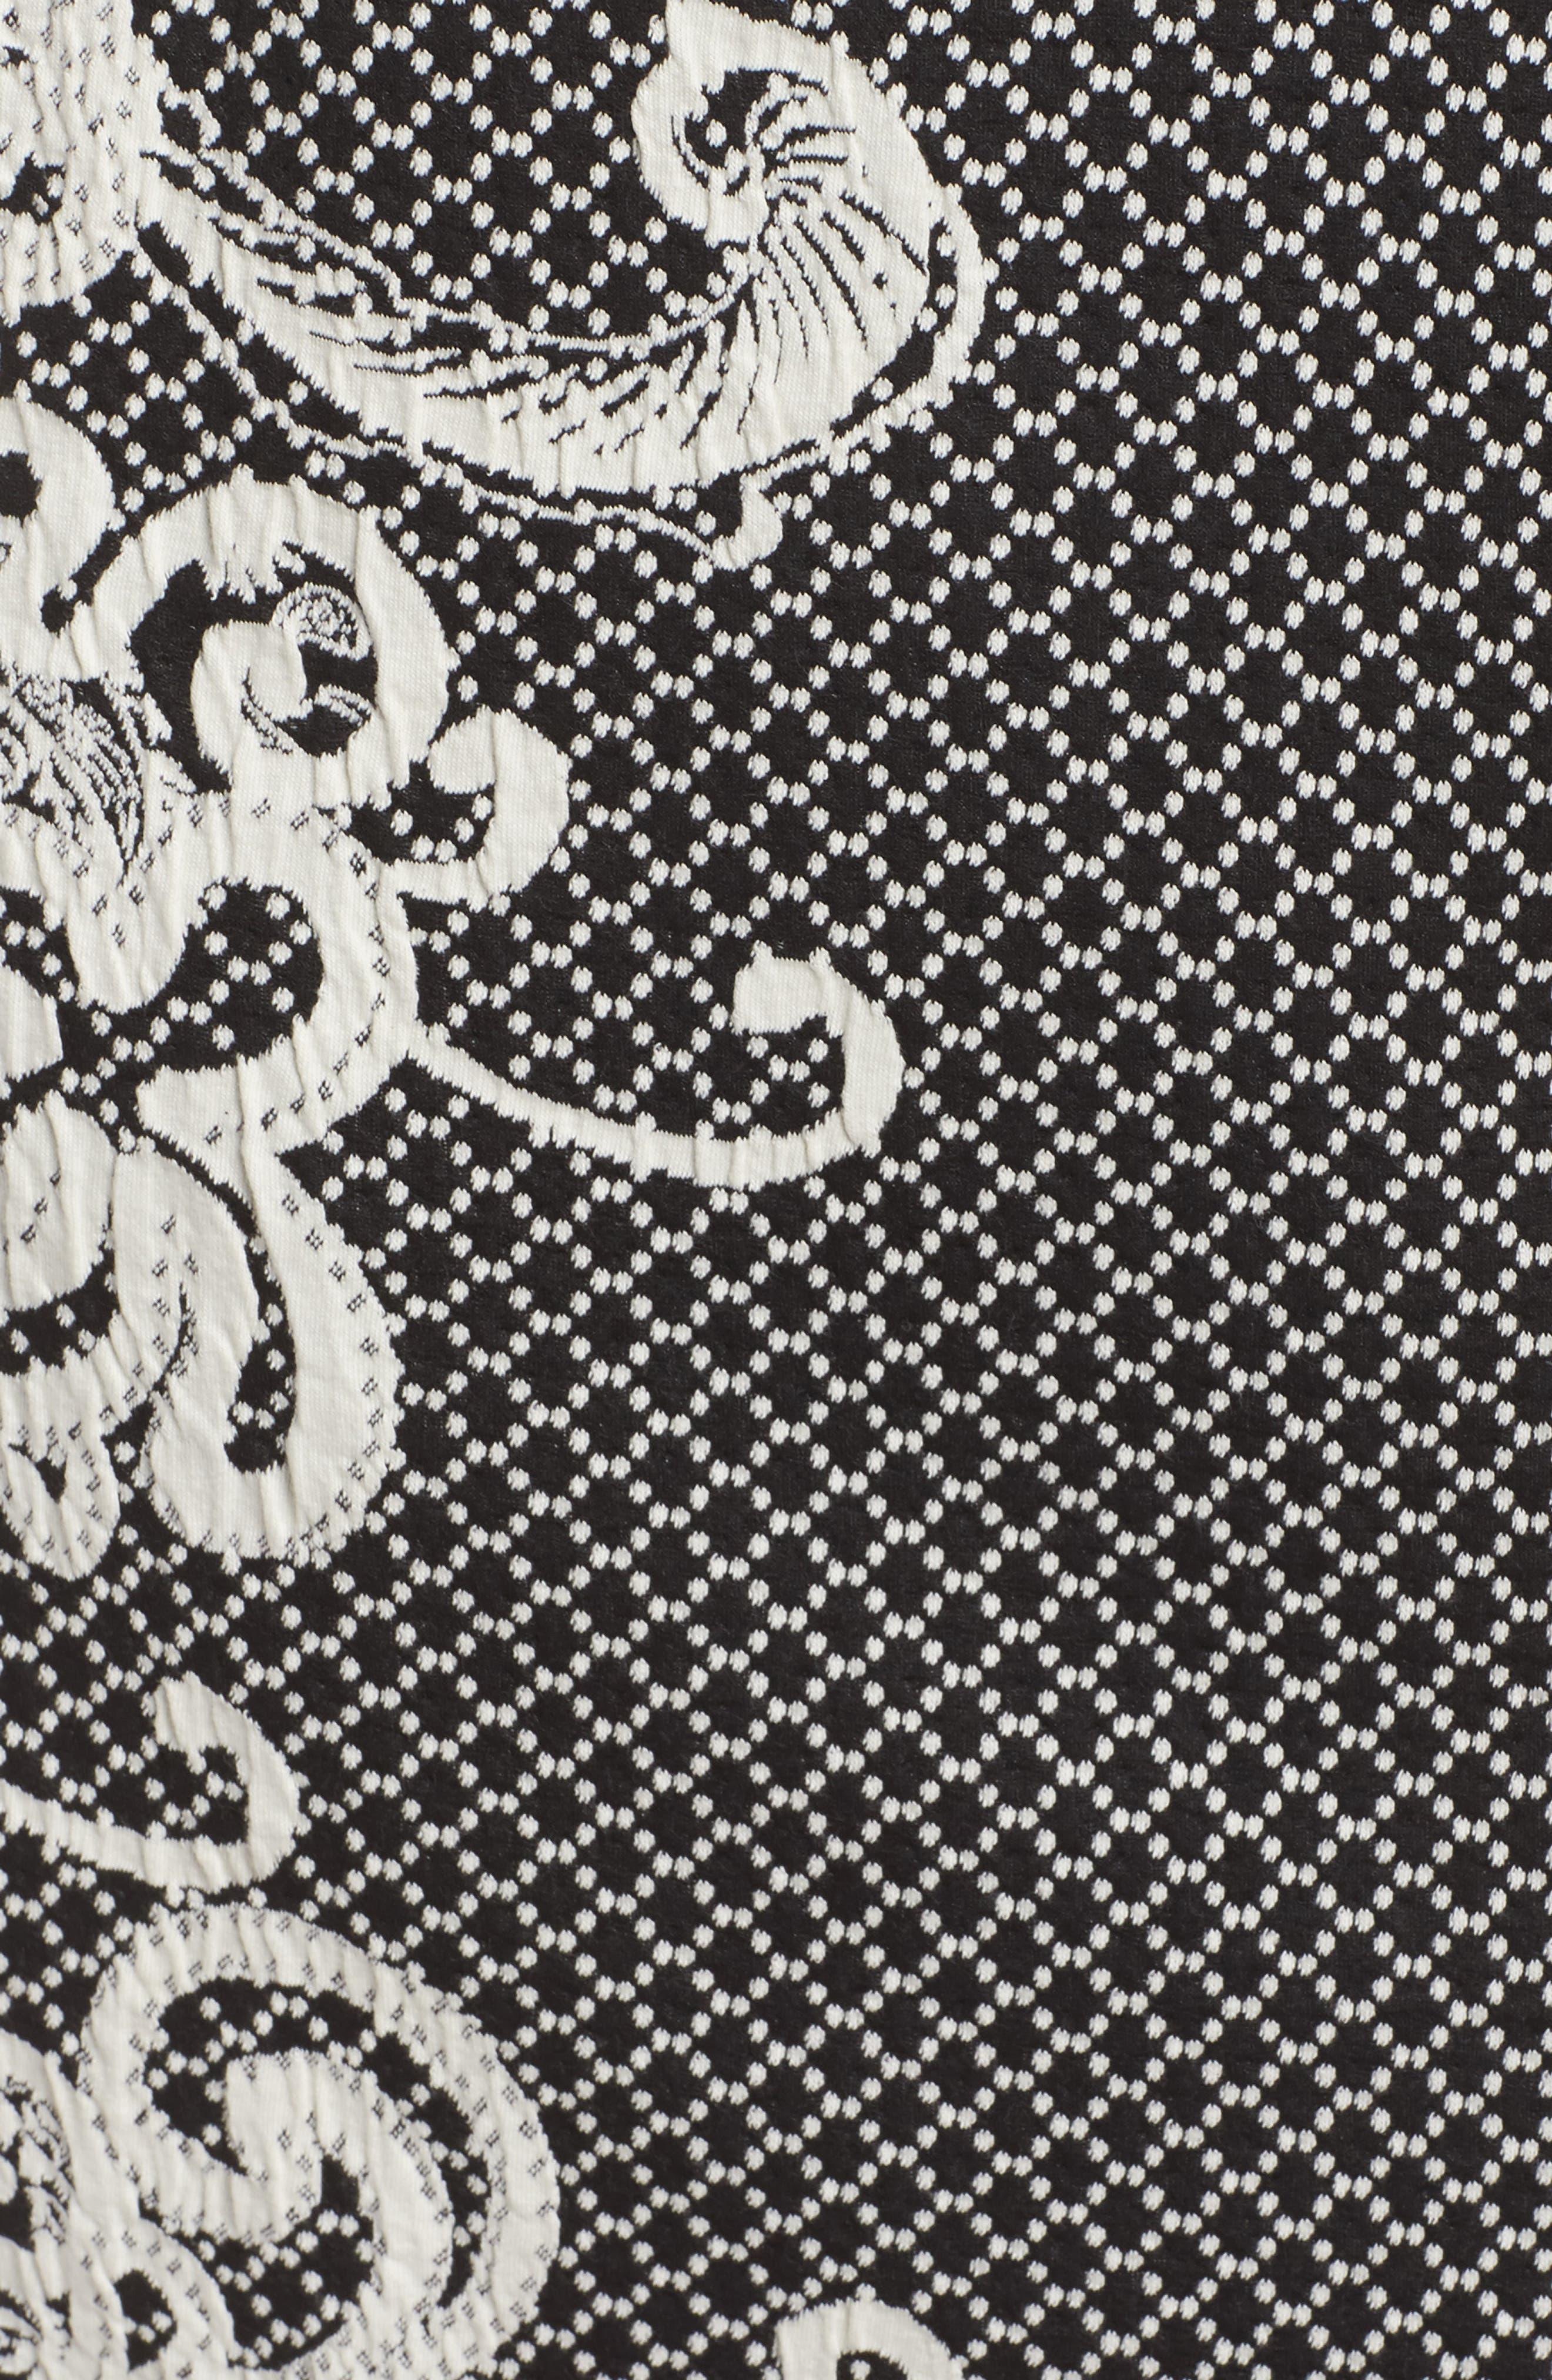 Scroll Border Knit Sheath Dress,                             Alternate thumbnail 5, color,                             Black/ Ivory